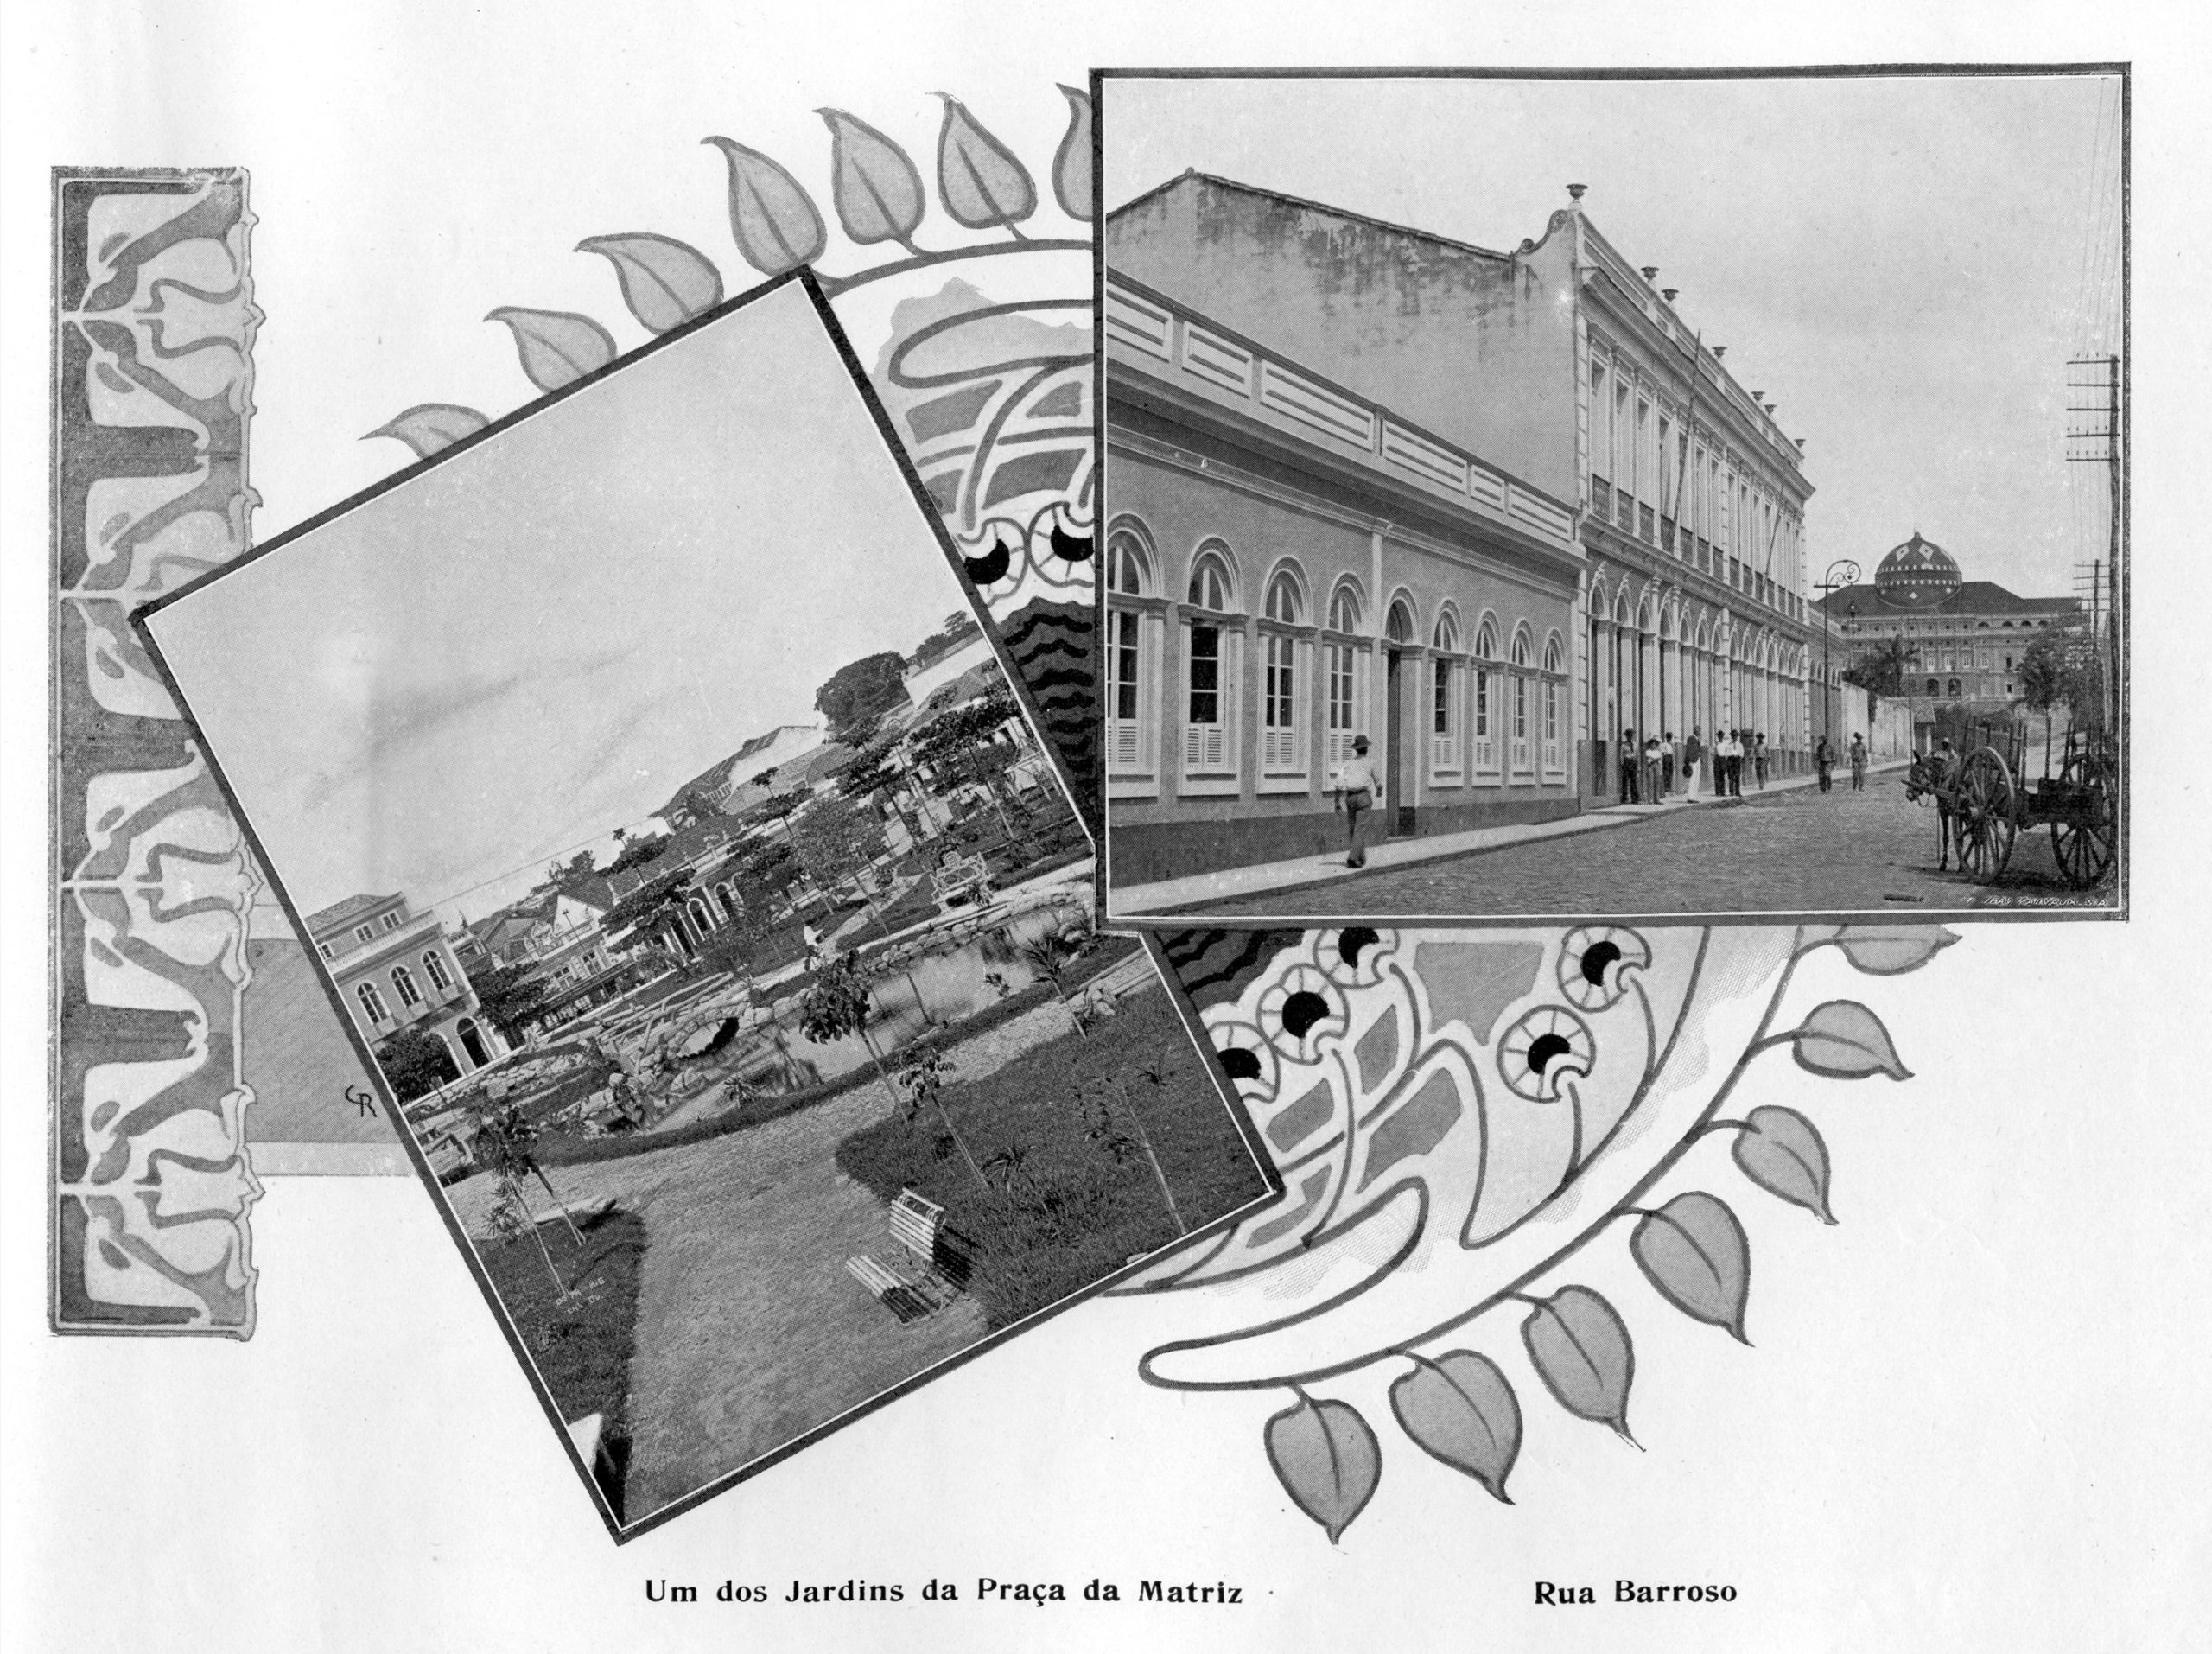 Jardim da Praça da Matriz e a Rua Barroso